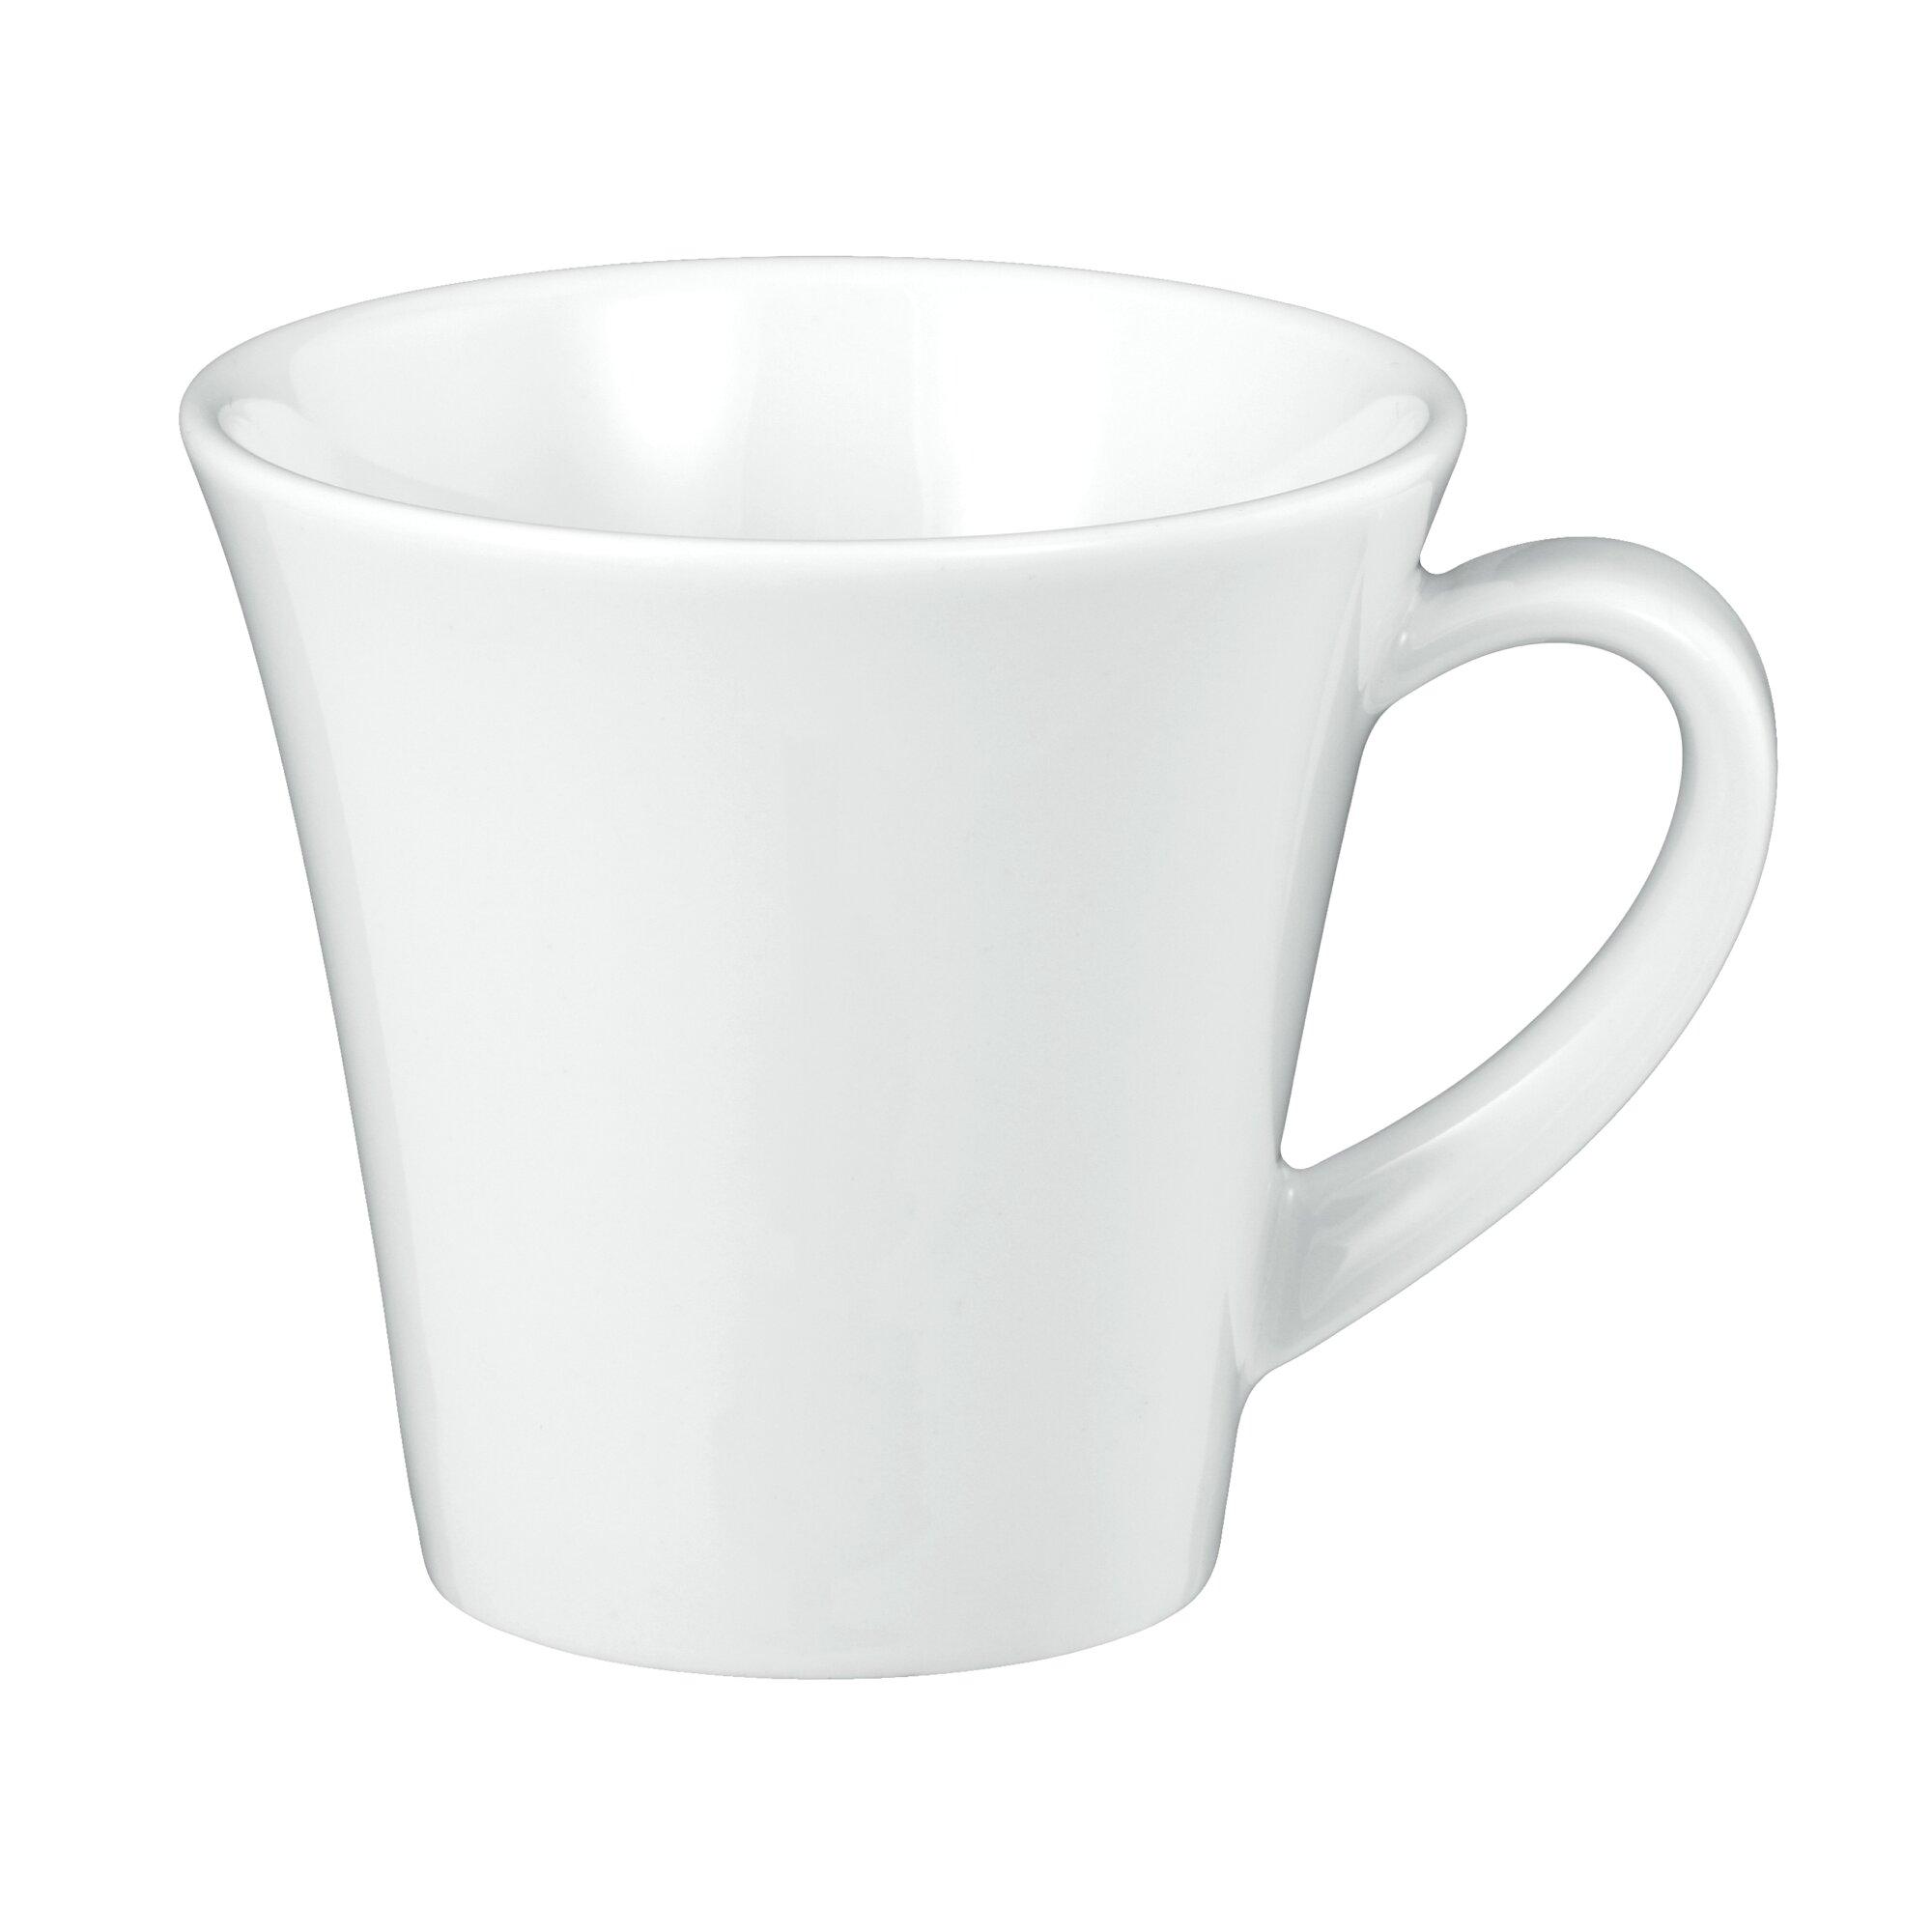 modern life 0 2l coffee cup wayfair uk. Black Bedroom Furniture Sets. Home Design Ideas